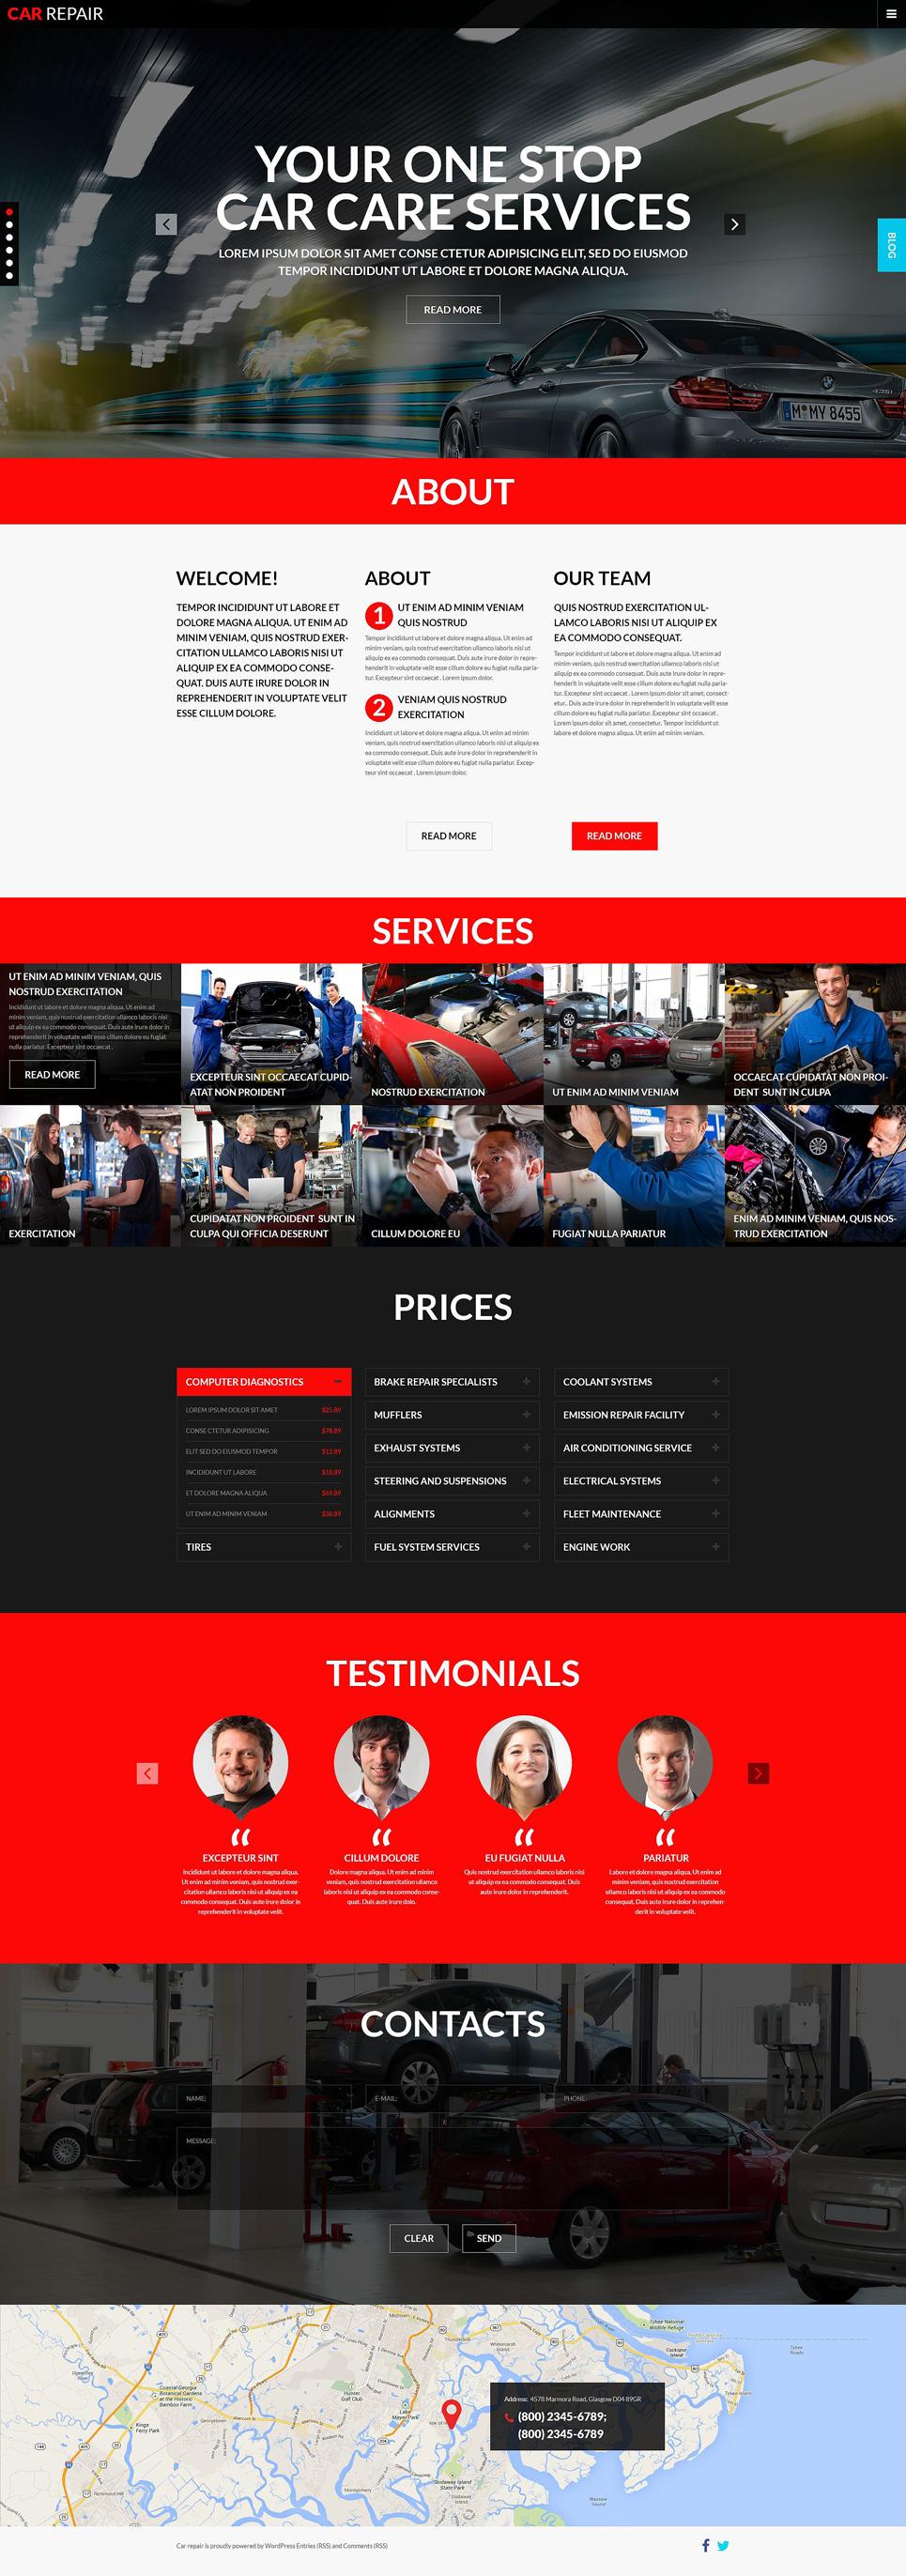 Адаптивный шаблон сайта на тему ремонт авто #51814